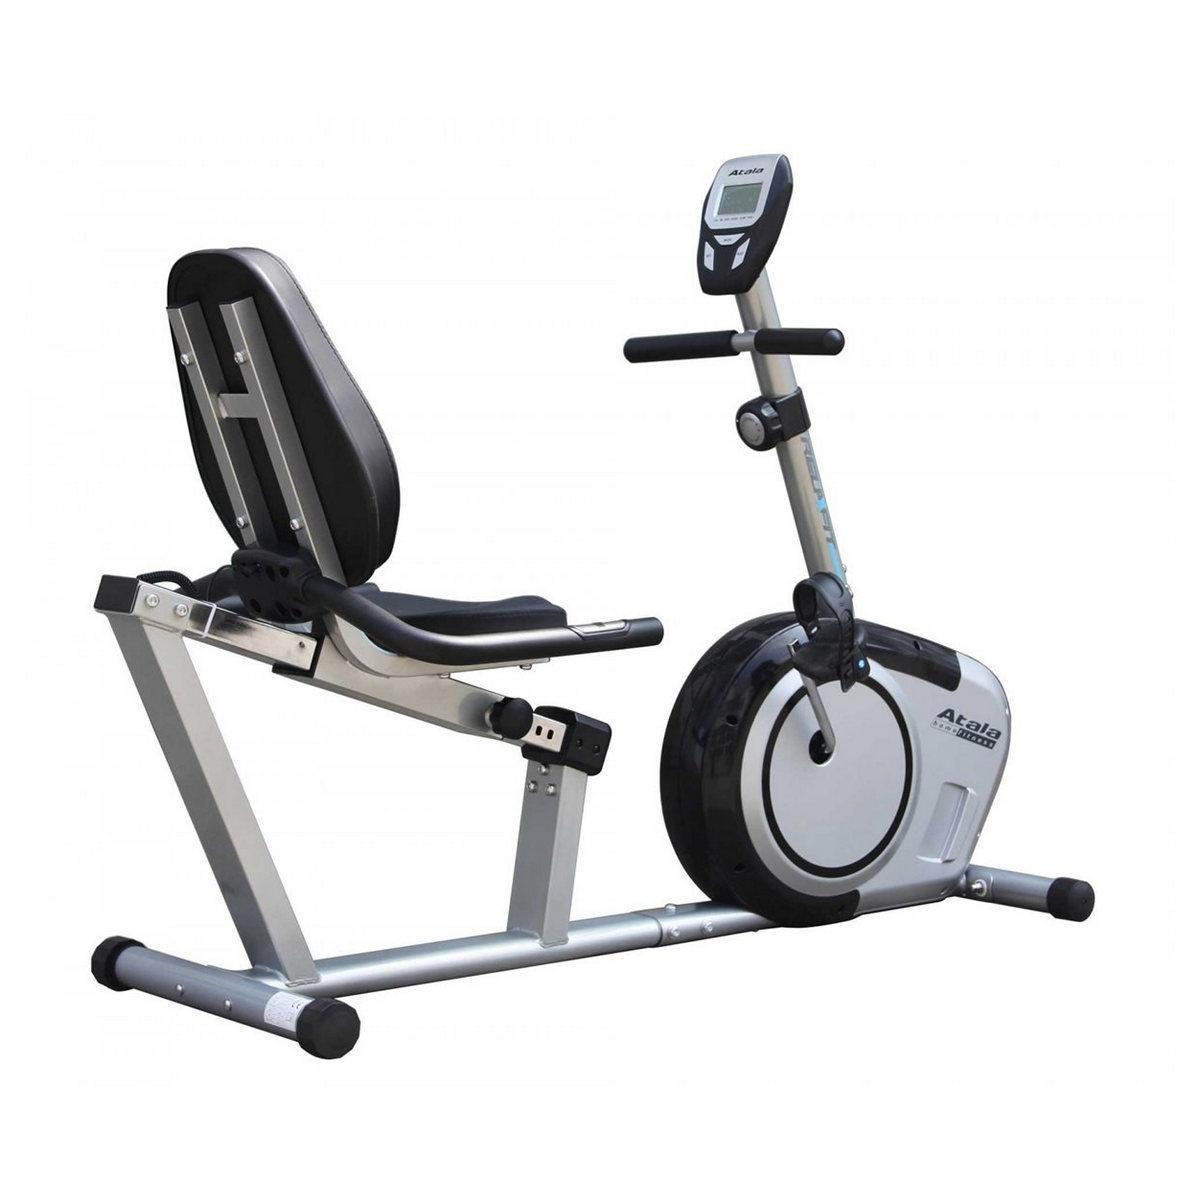 relaxfit elliptical 1000 v1